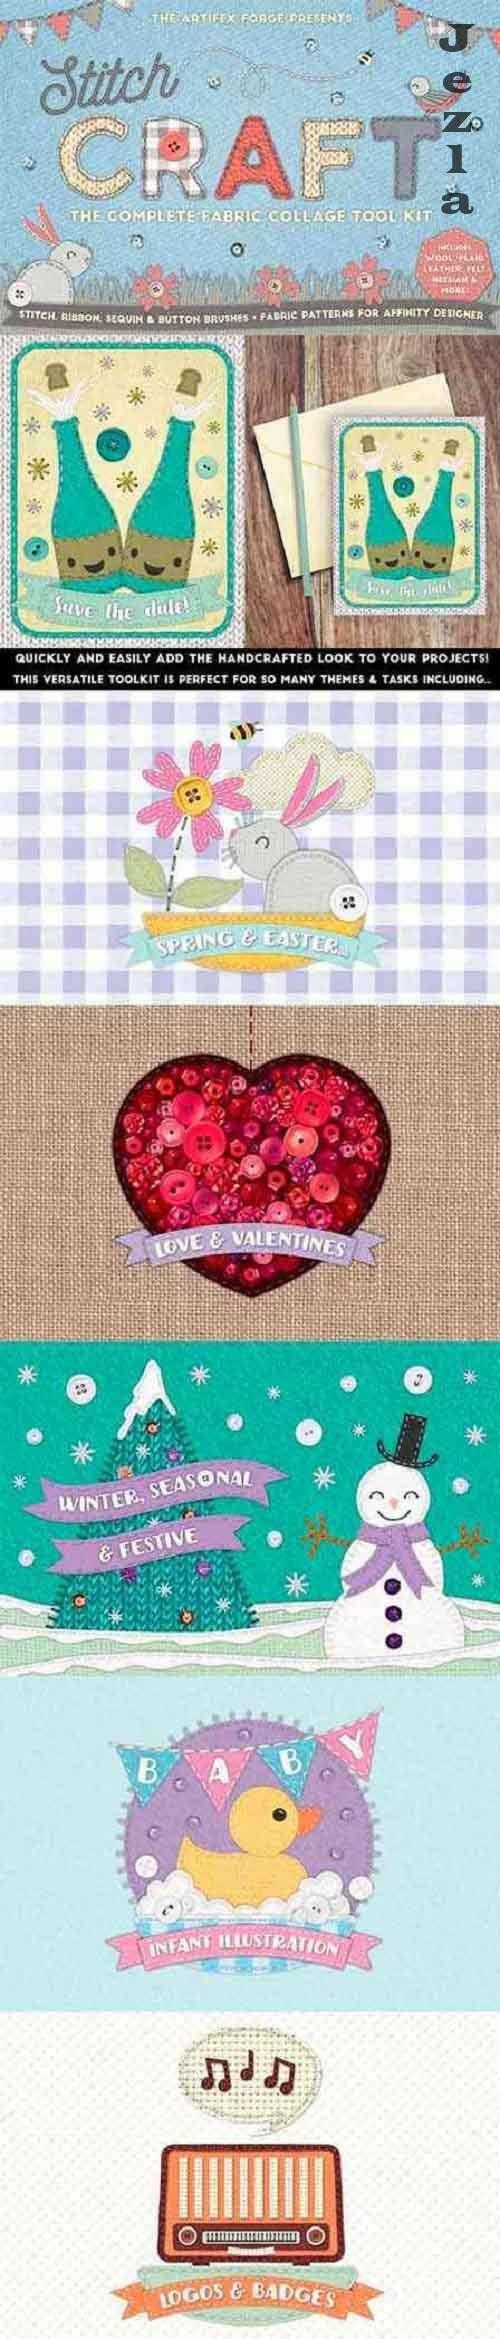 Creativemarket - Stitch Craft - Brushes & Styles 5489909